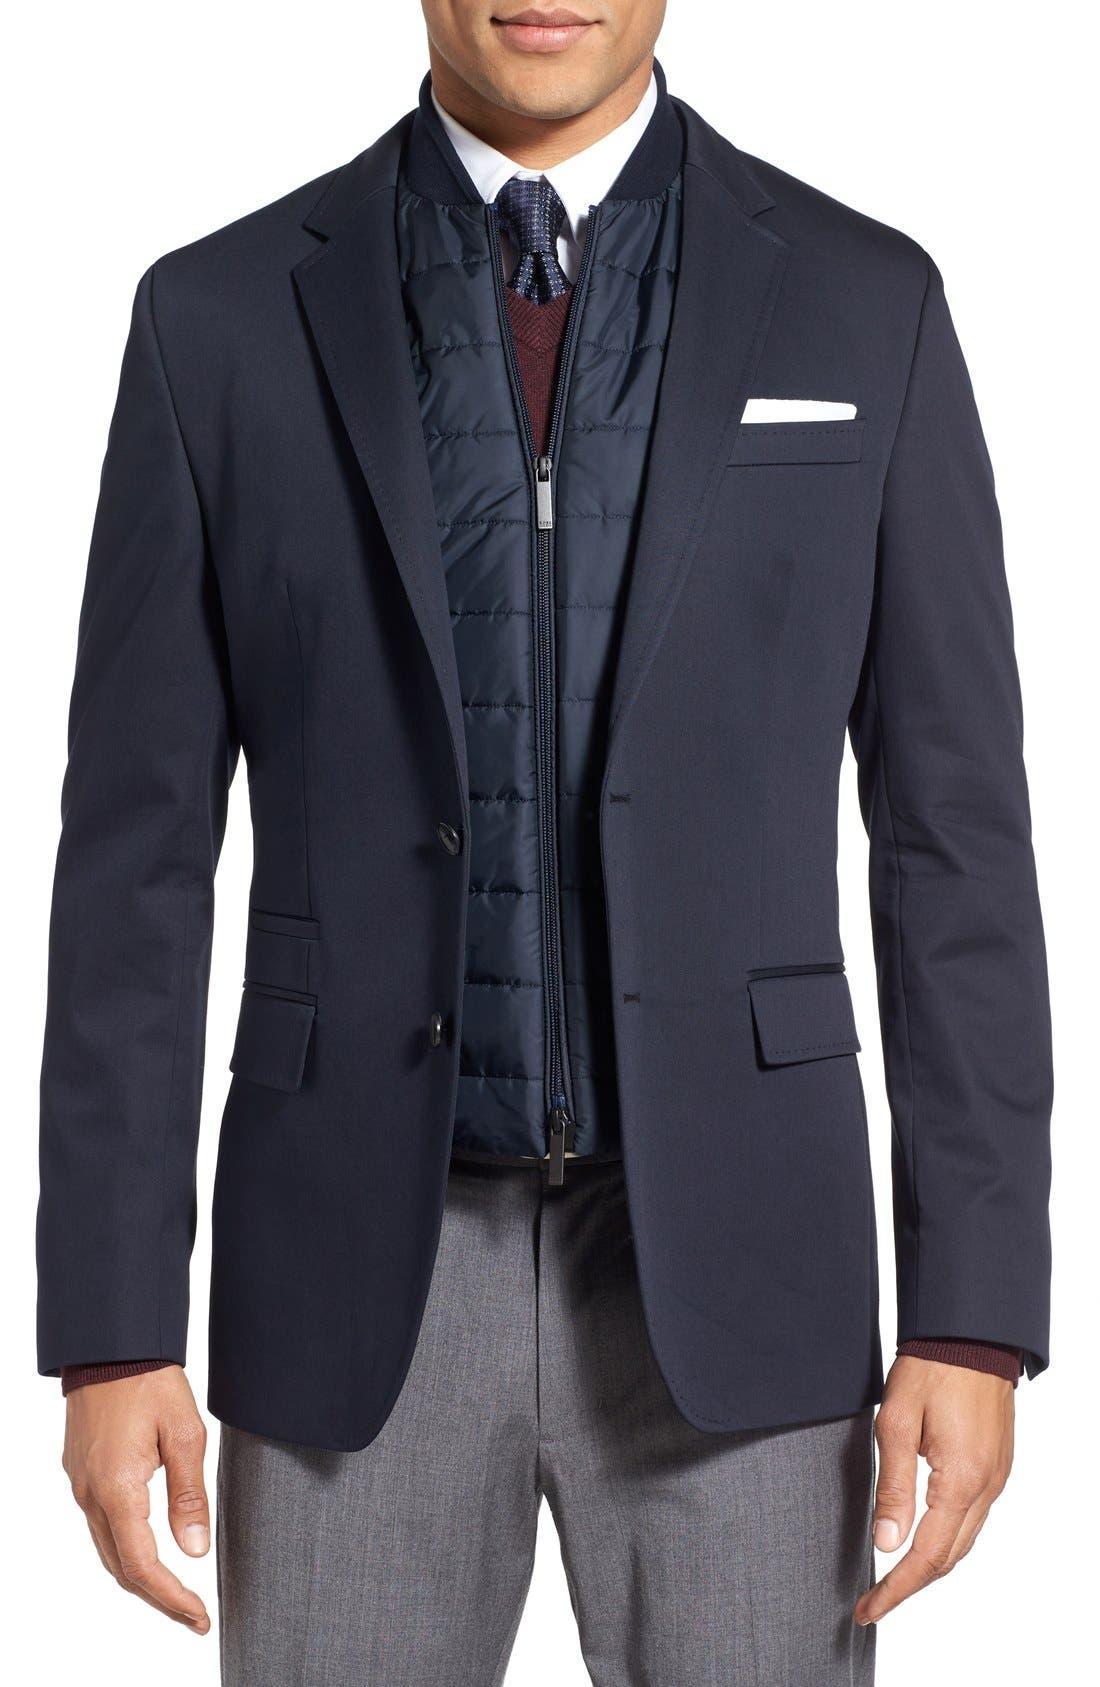 Main Image - BOSS 'Hadwart' Trim Fit Cotton Blend Blazer